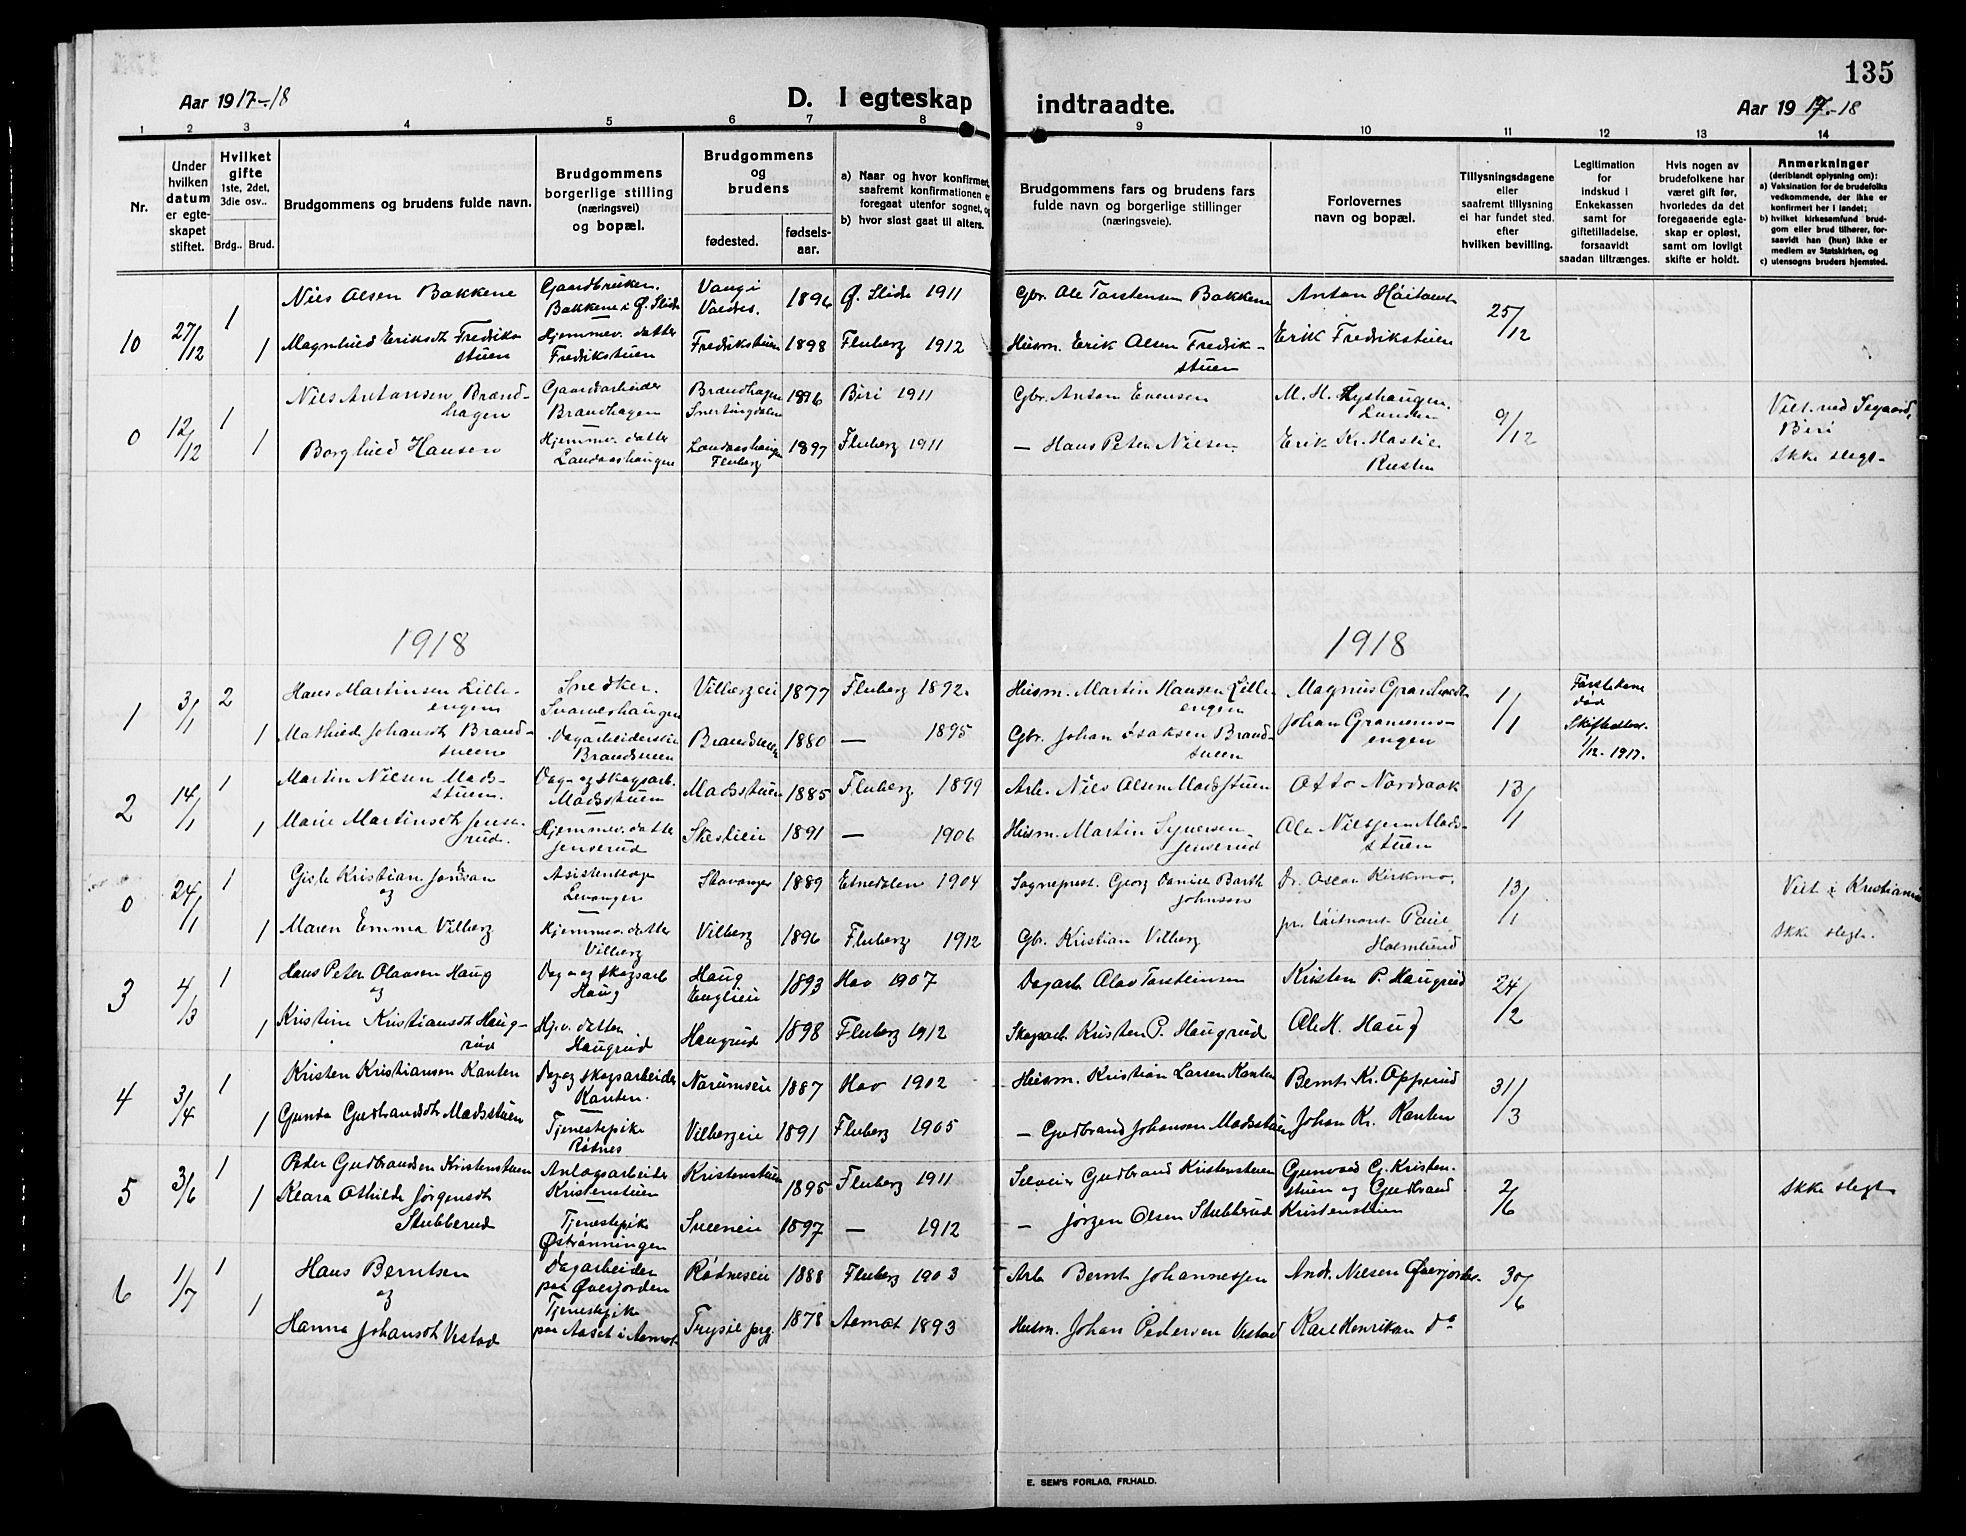 SAH, Søndre Land prestekontor, L/L0006: Klokkerbok nr. 6, 1912-1925, s. 135